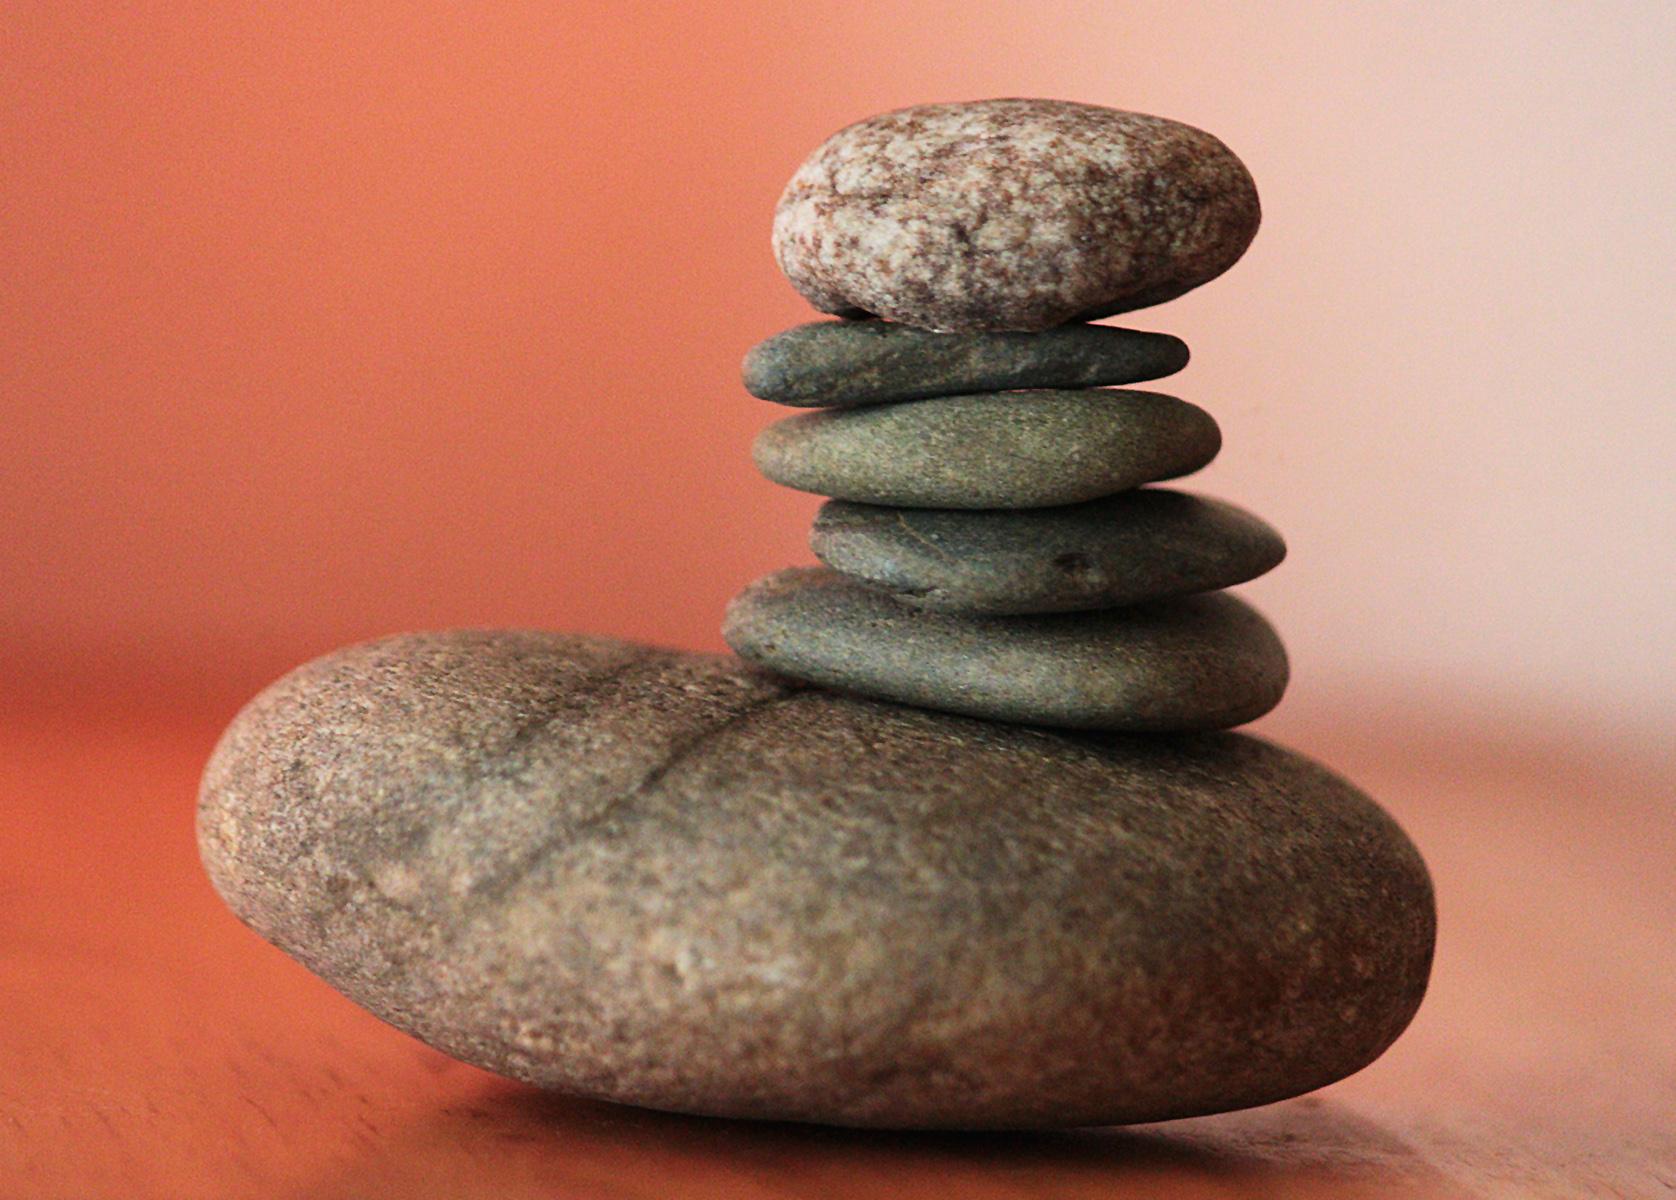 Stilllife Stone Stack - 005/365